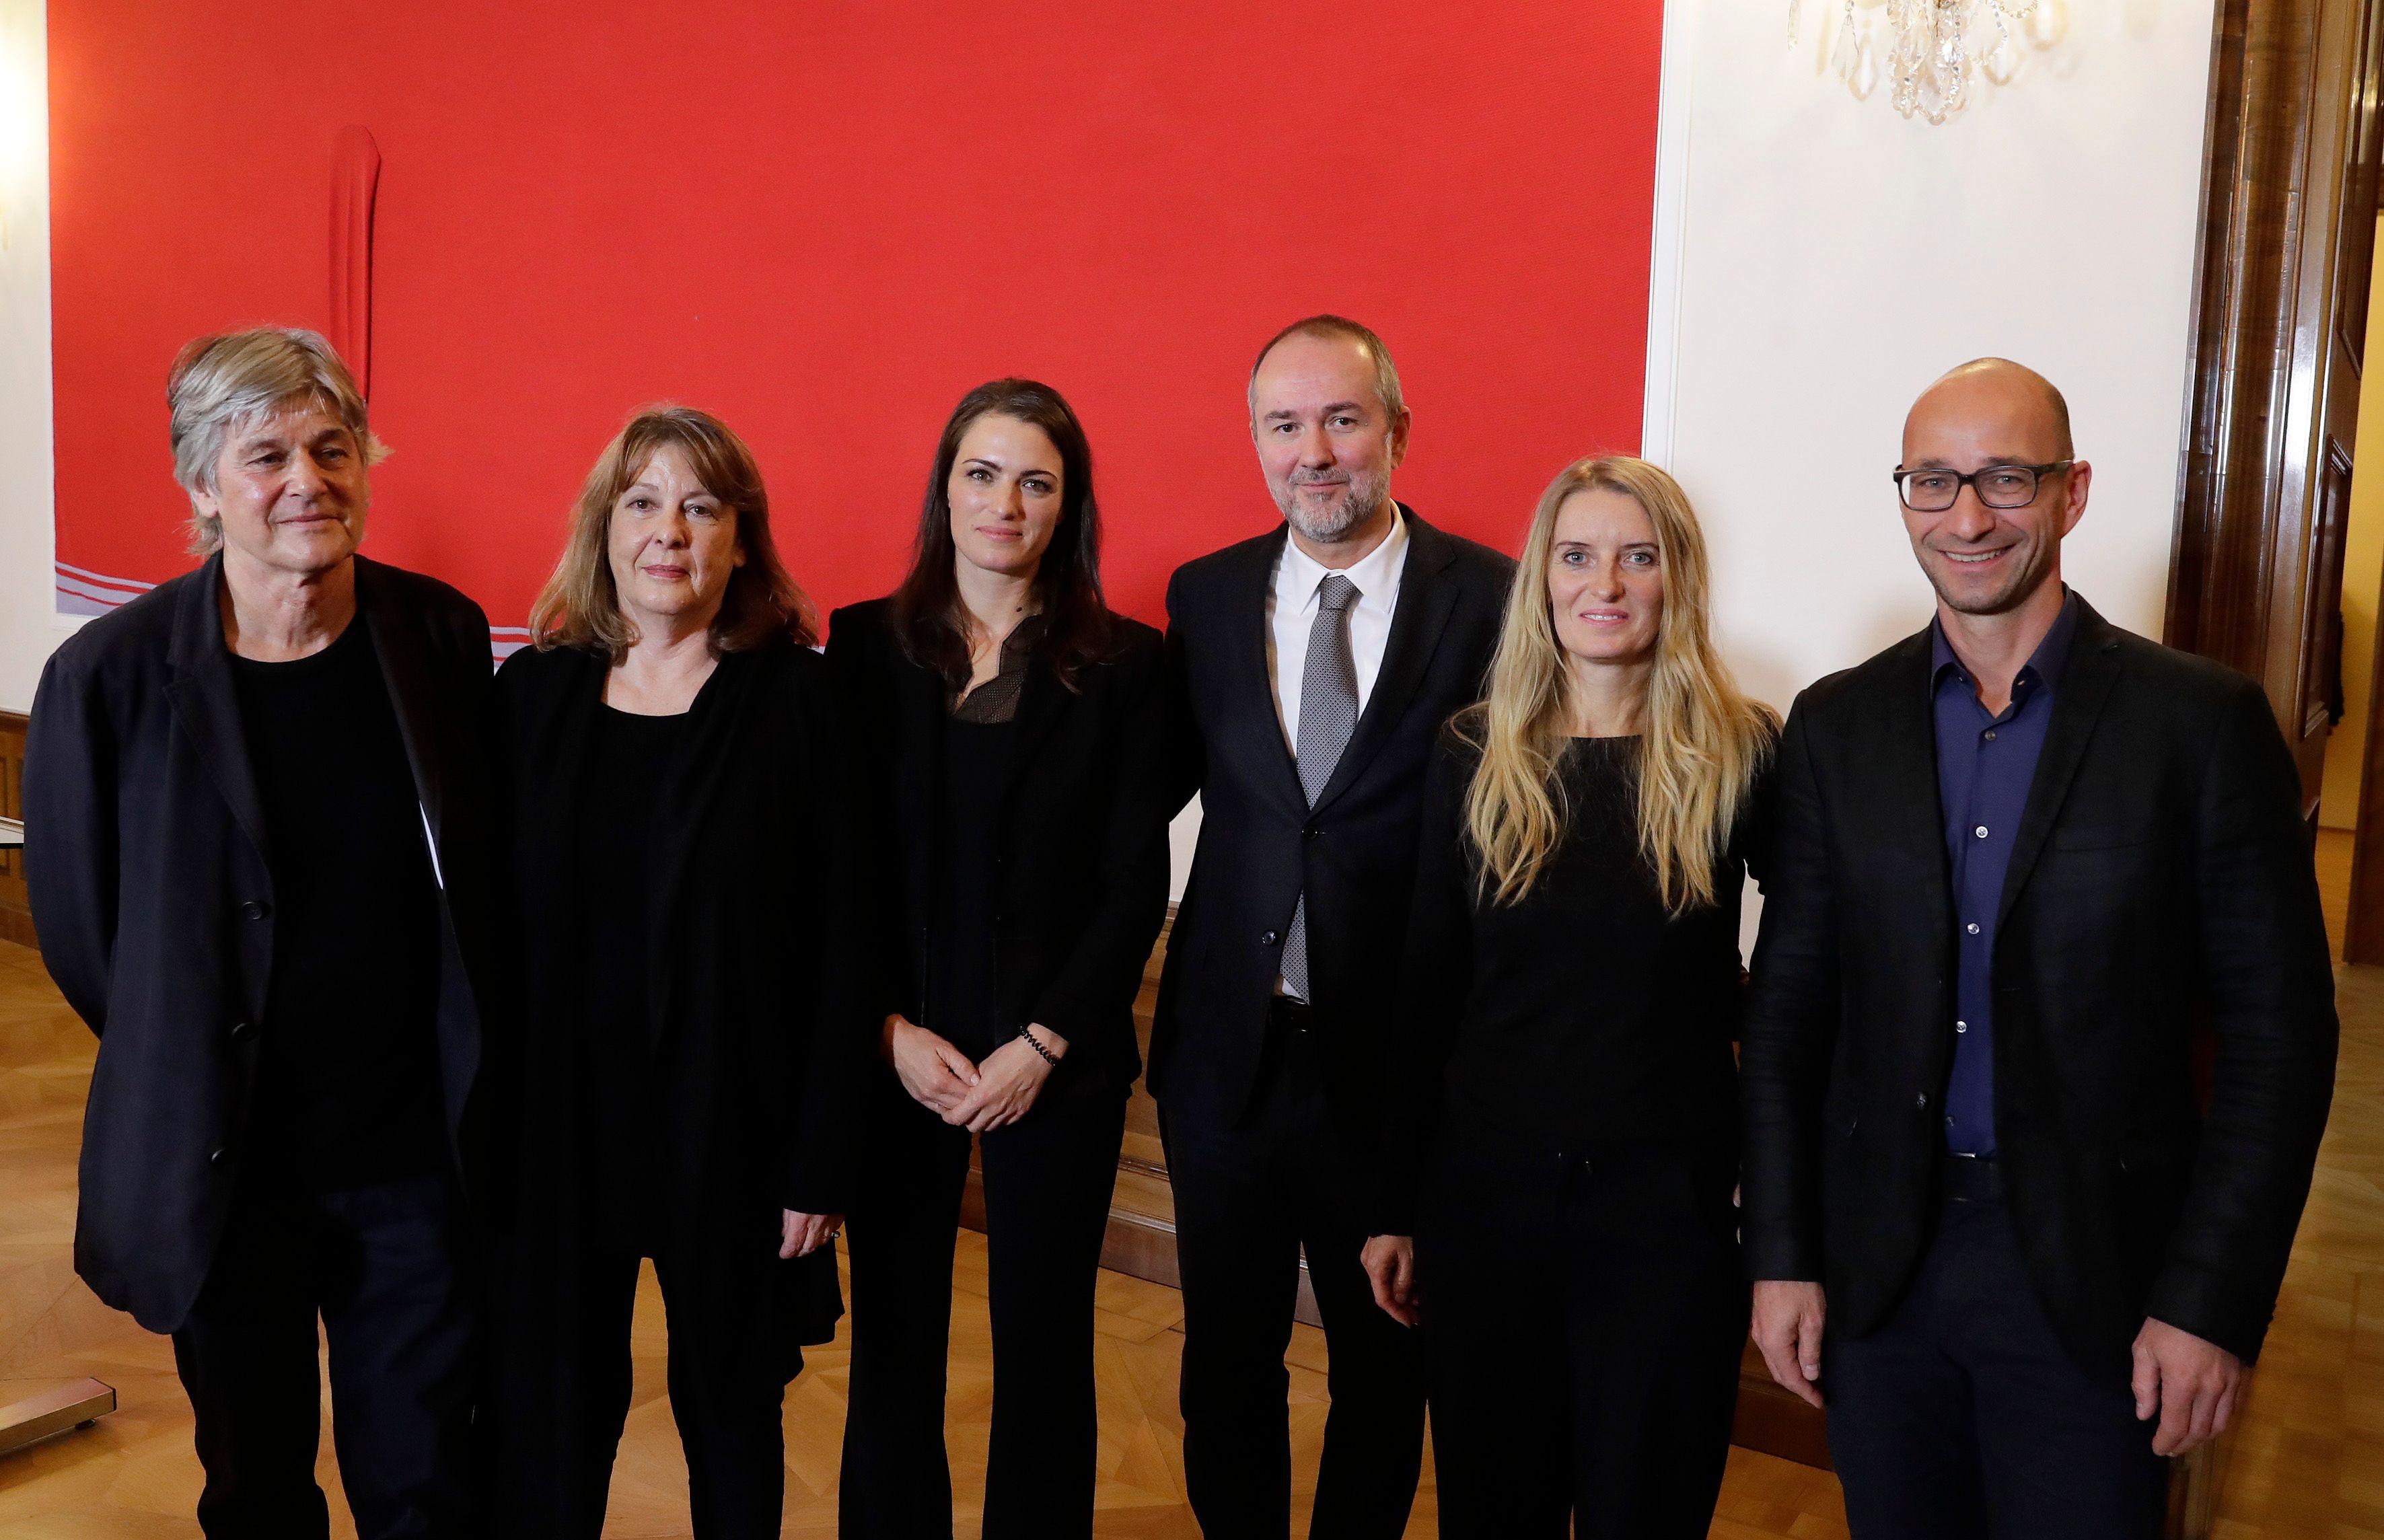 Pressekonferenz 16. Architektur-Biennale 2018, v.li.n.re: Dieter Henke, Marta Schreieck, Verena Konrad, Thomas Drozda, Kathrin Aste, Frank Ludin Foto: Regina Aigner